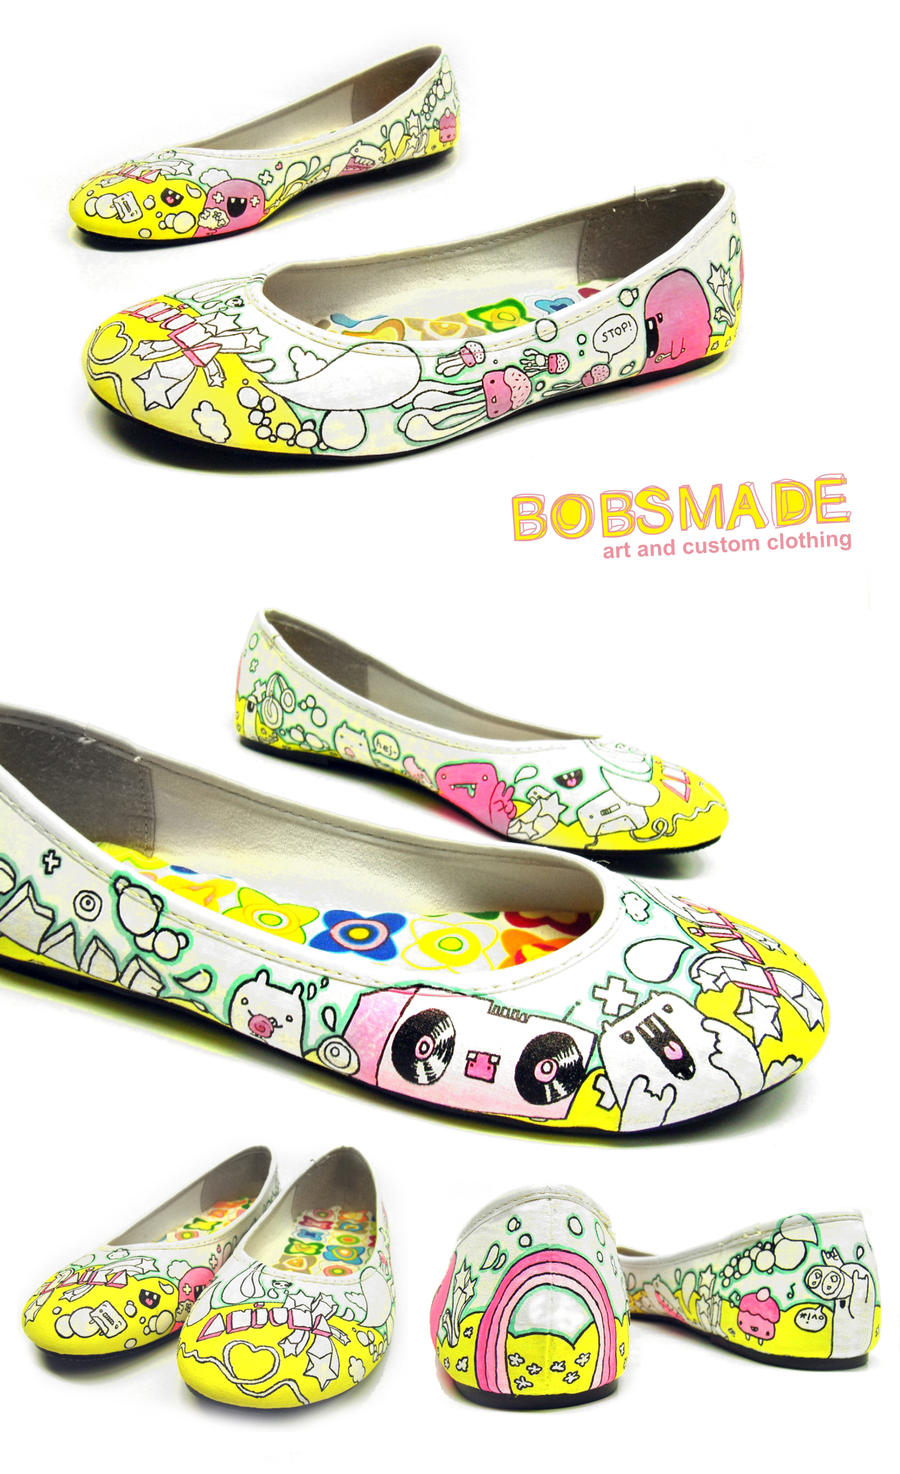 Bobsmade_shoes-anjuna by Bobsmade